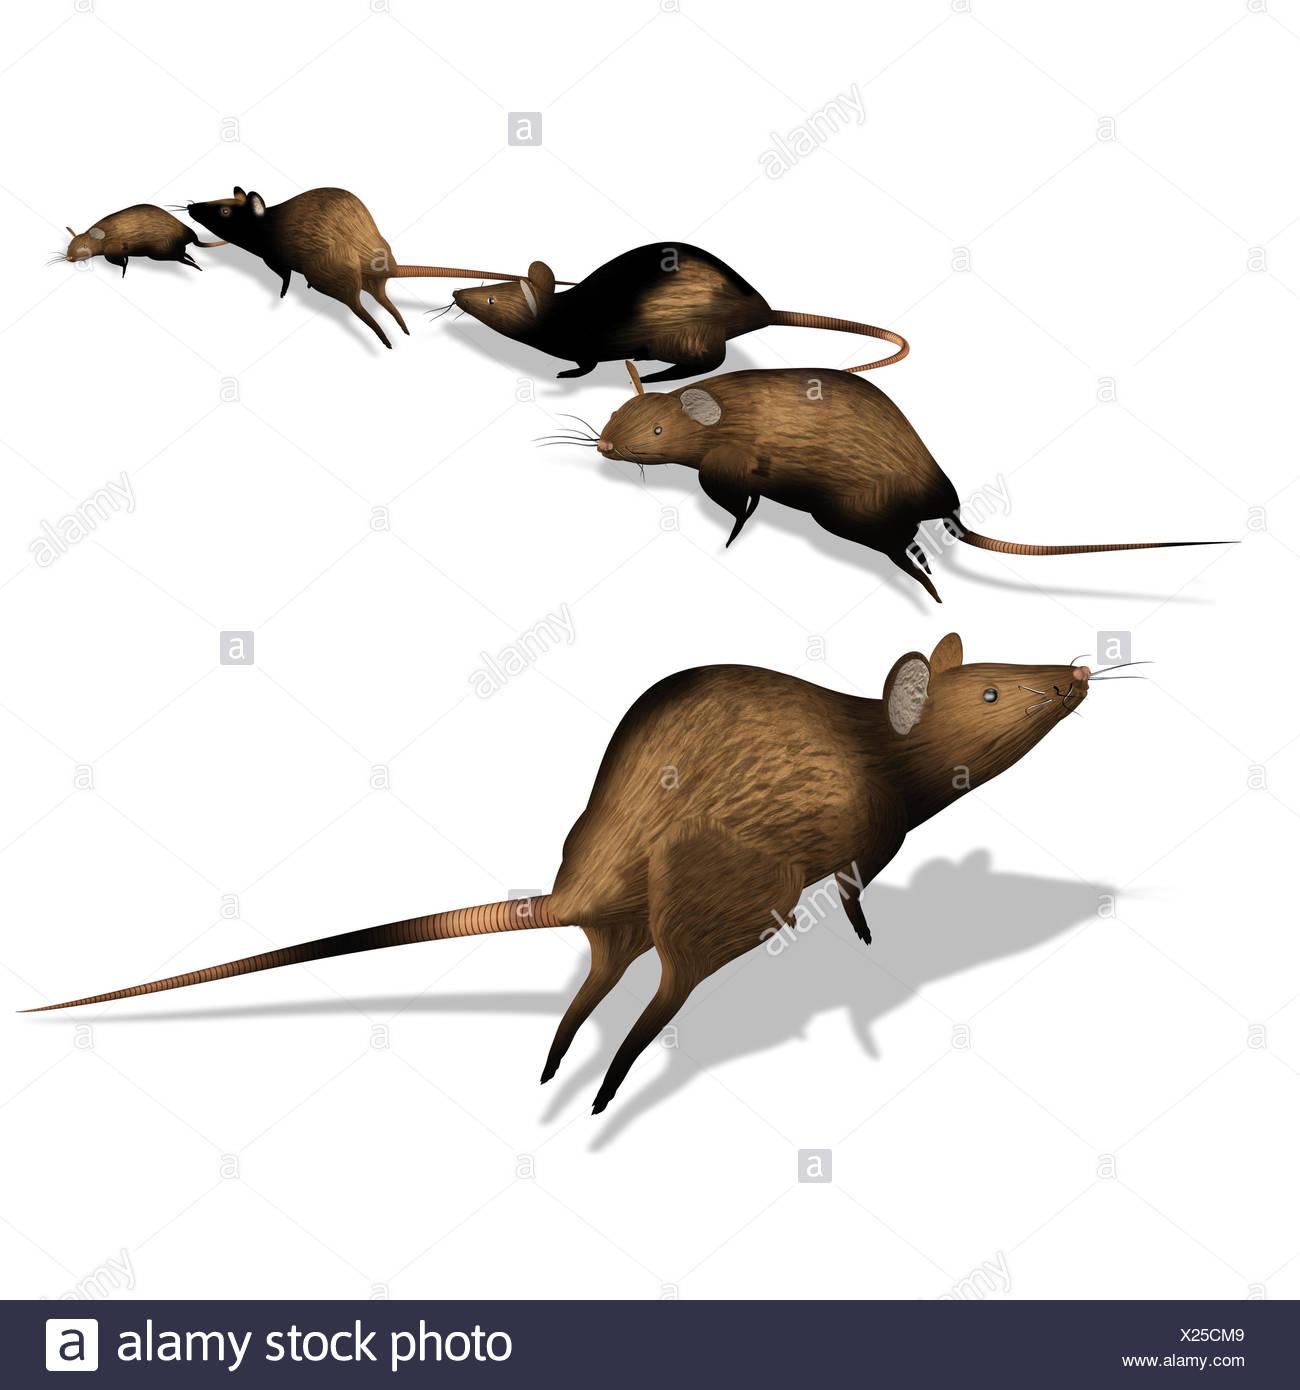 rats escape - Stock Image